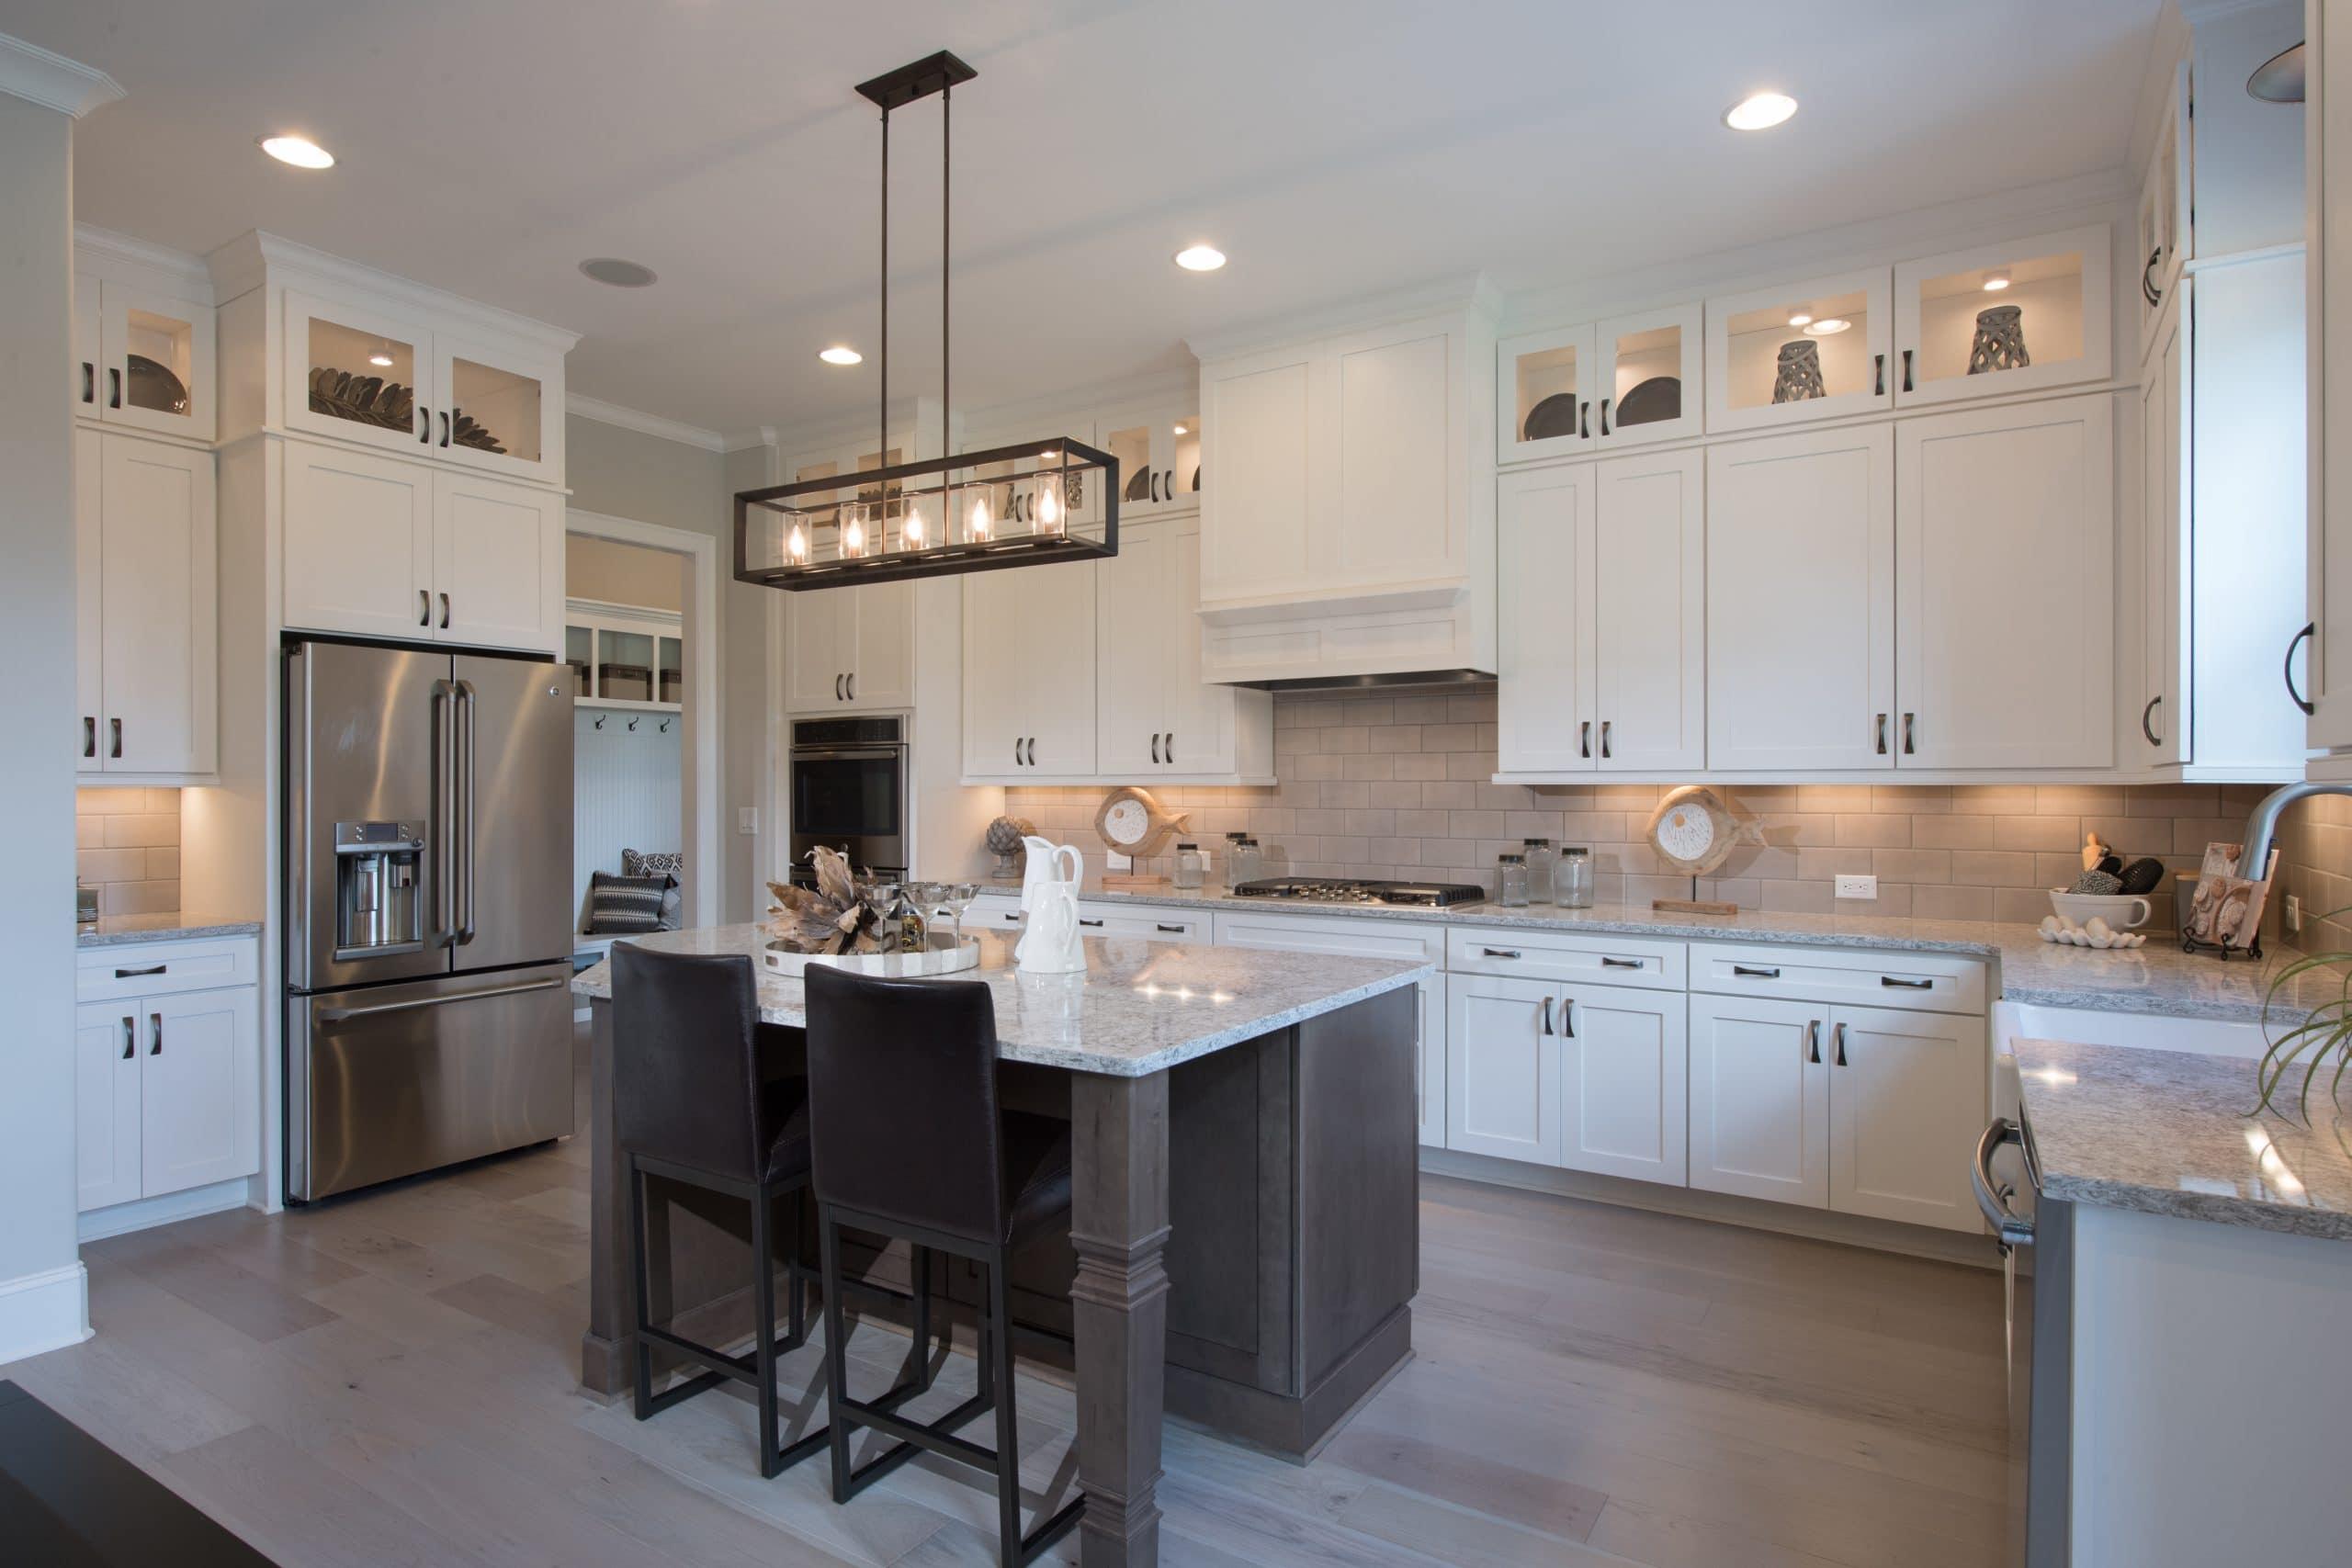 New Johns Creek Homes Coming Soon at Newest Phase at Bellmoore Park